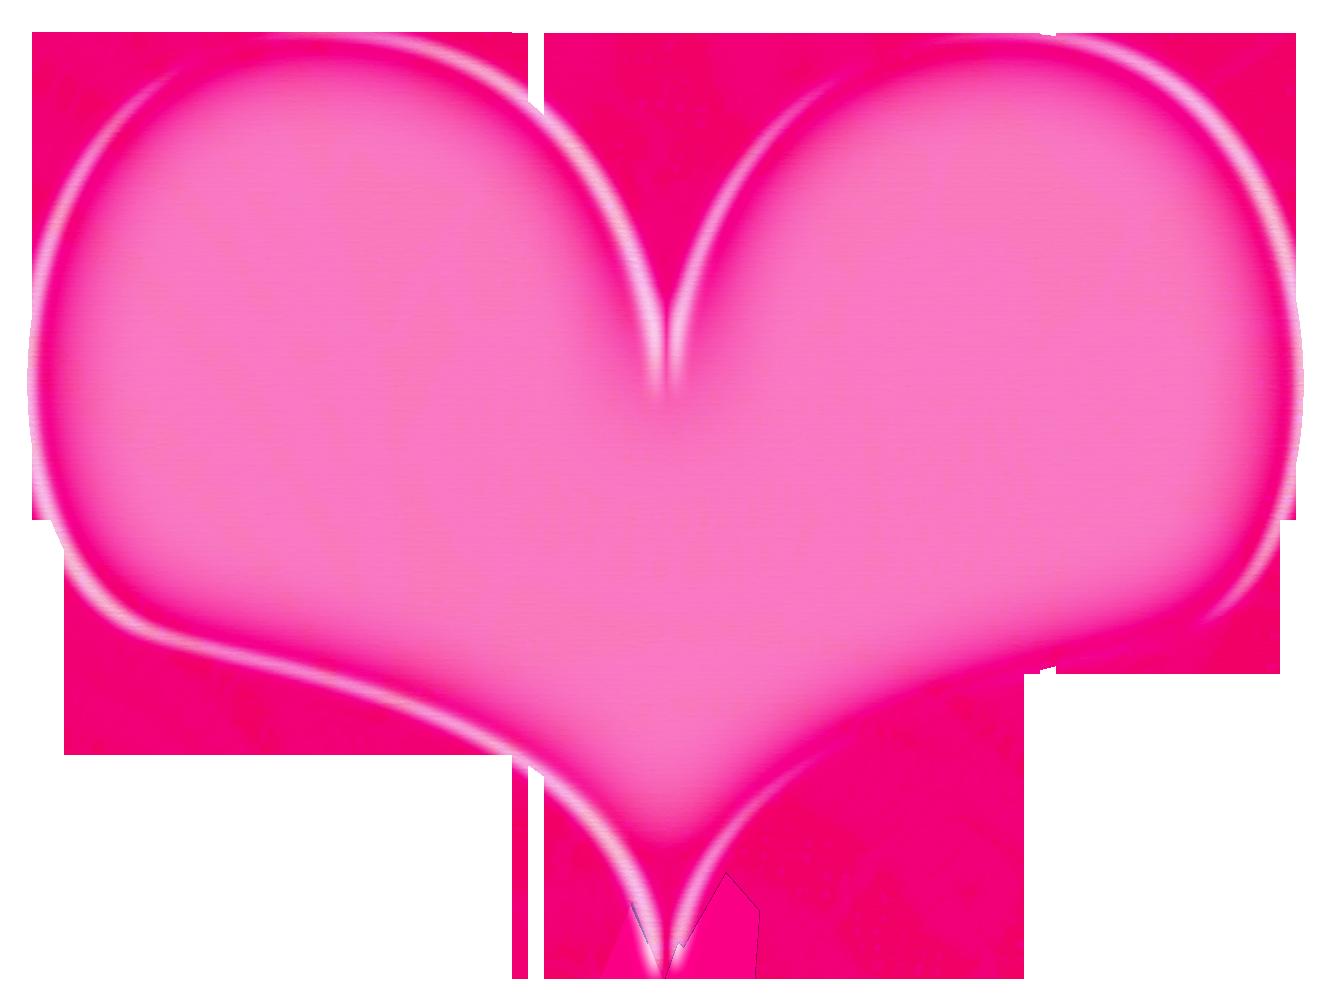 Hot Pink Heart PNG File SVG Clip arts